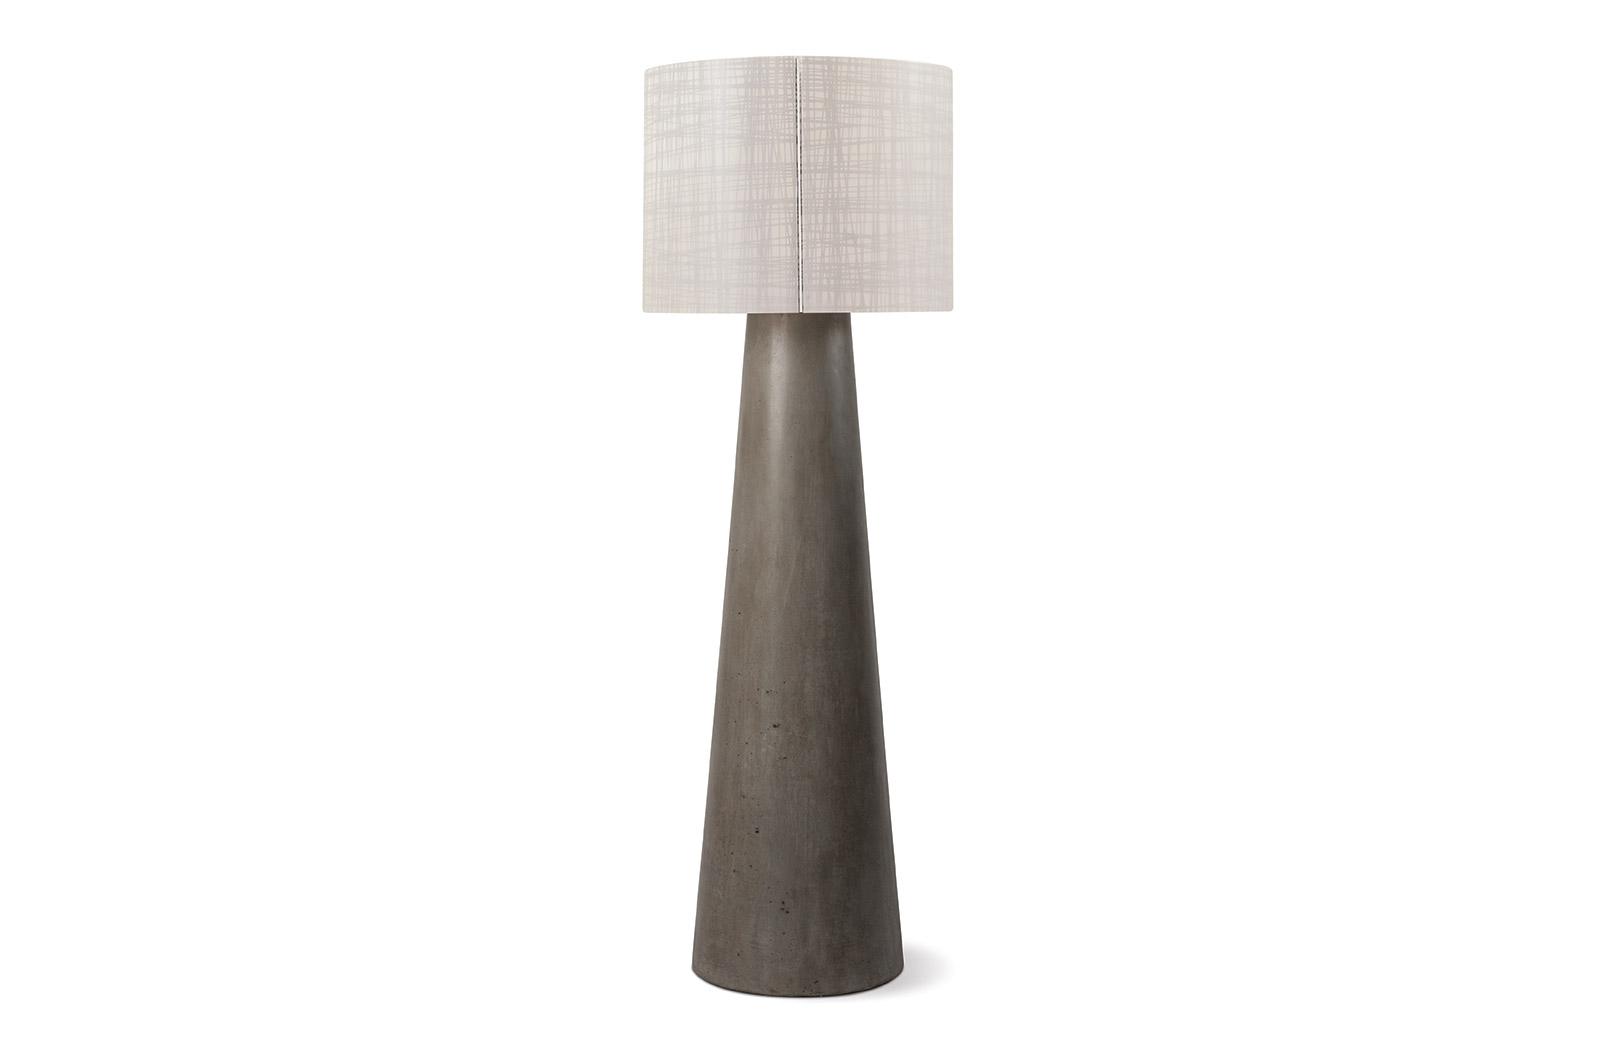 quality design e3b00 c3f44 Inda Cordless Outdoor LED Floor Lamp